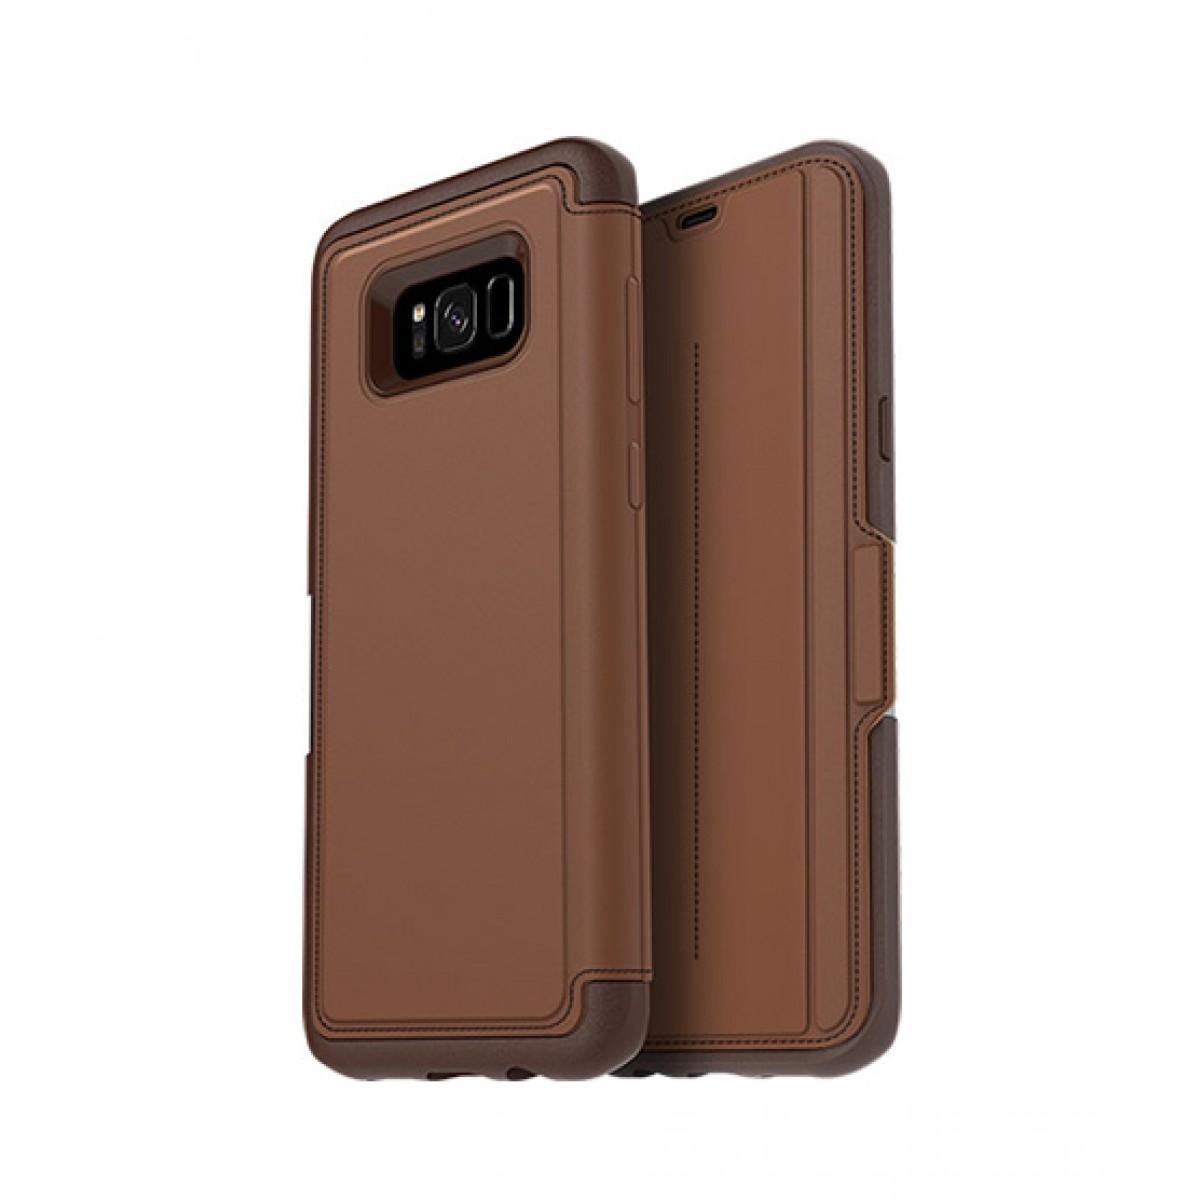 wholesale dealer d3fd2 c563d OtterBox Strada Series Leather Folio Burnt Saddle Case For Galaxy S8+